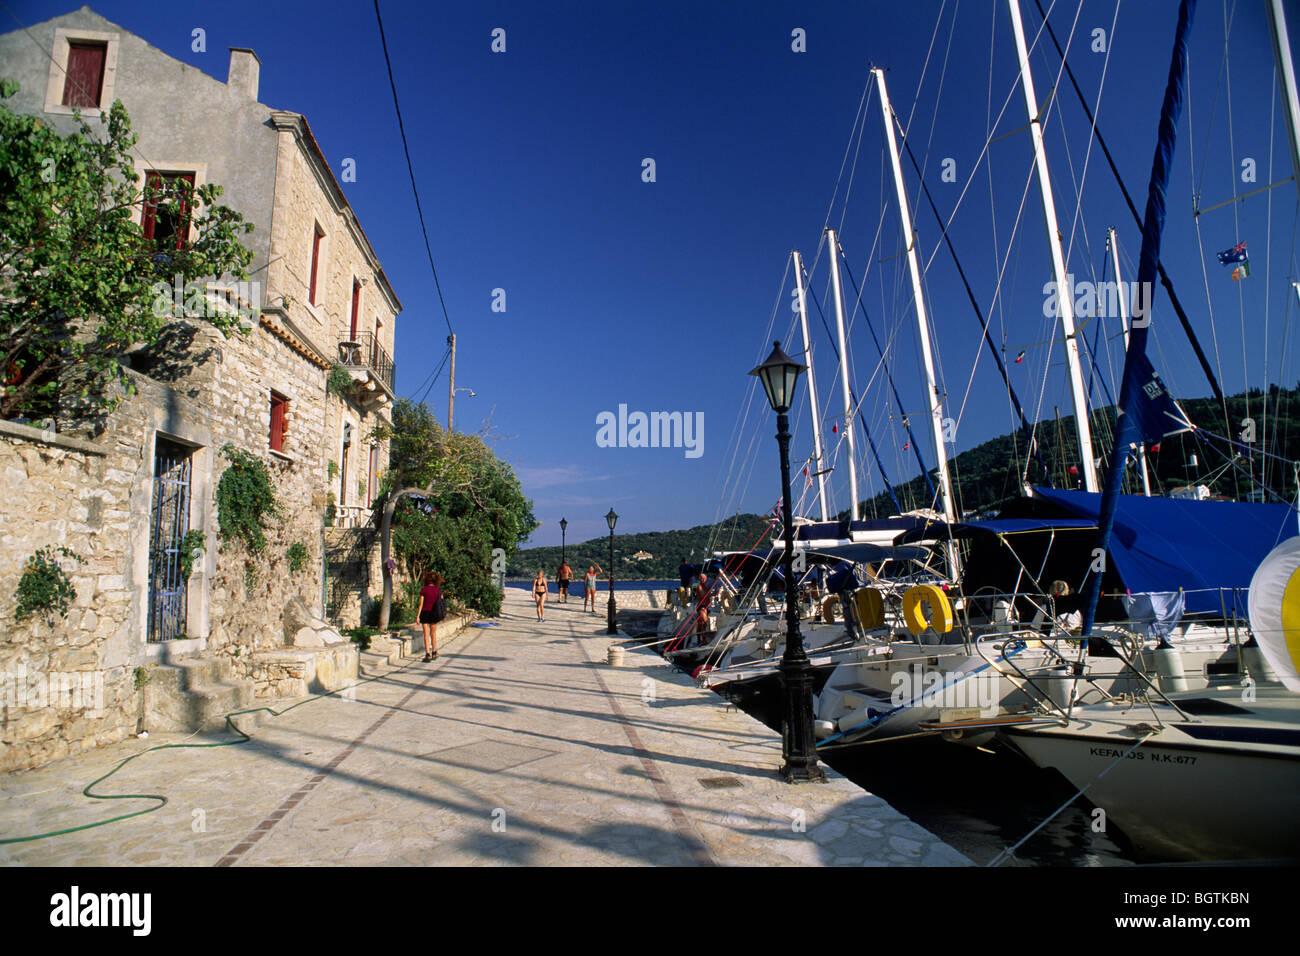 greece, ionian islands, ithaca, kioni waterfront - Stock Image